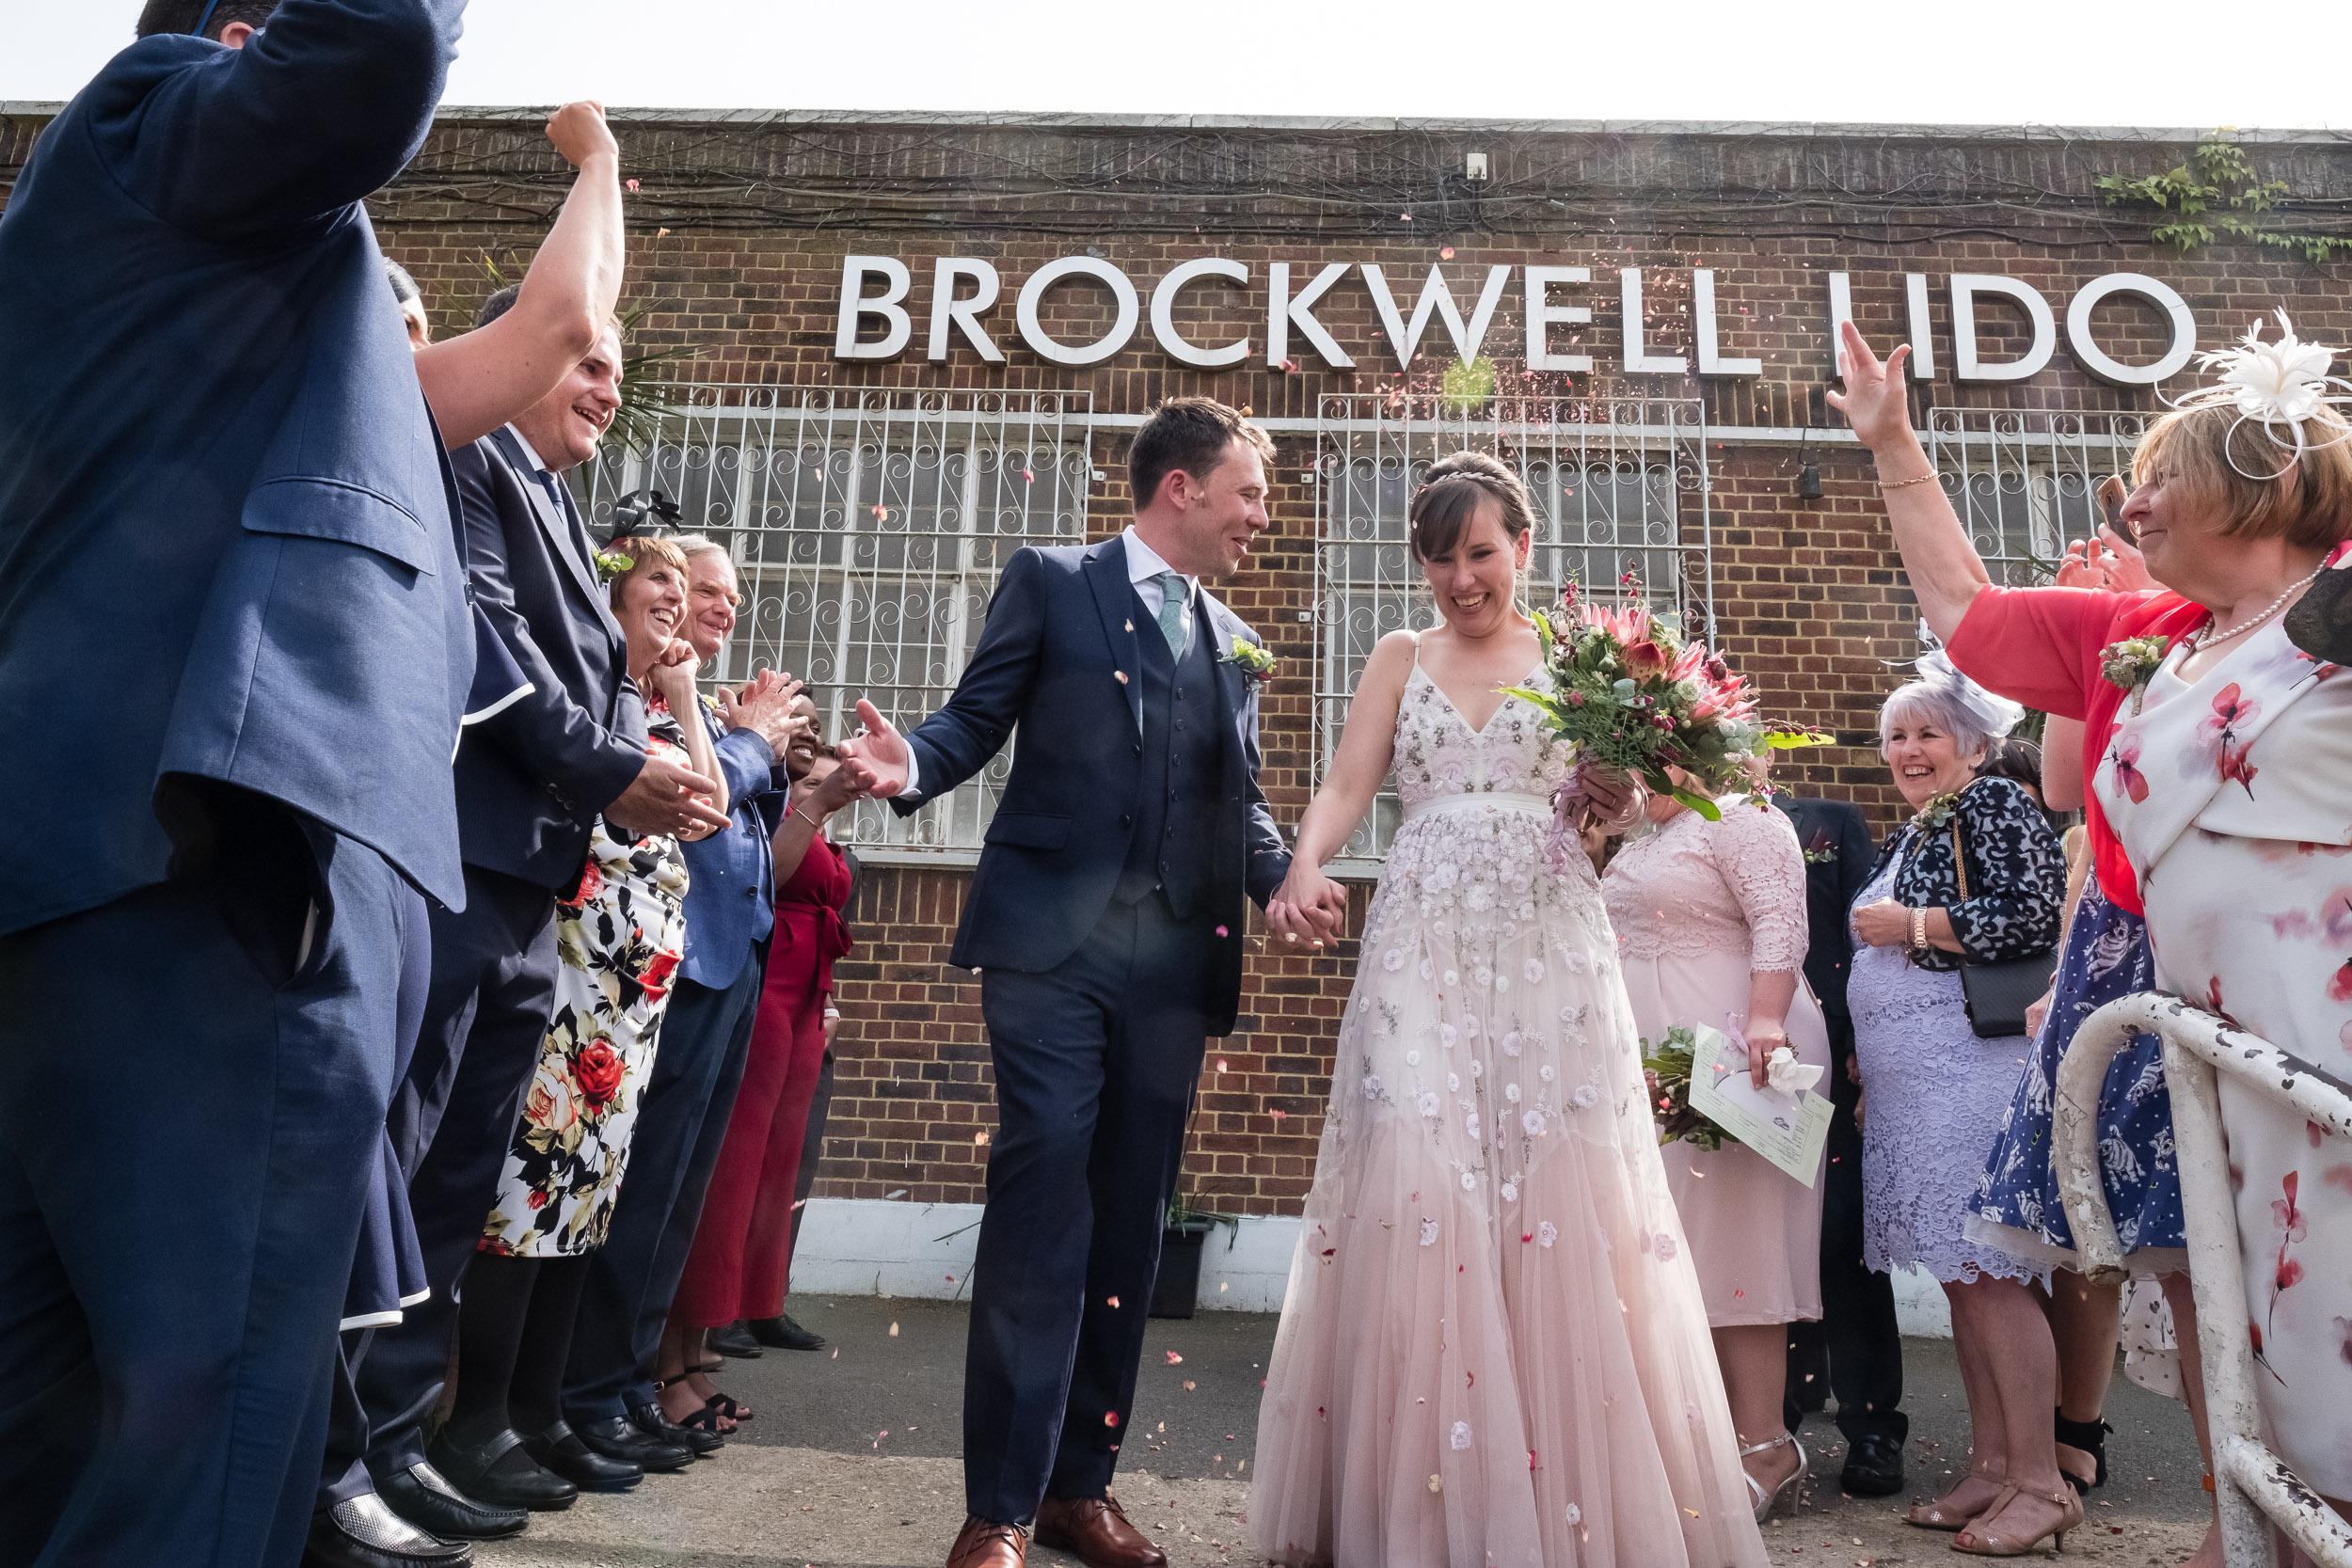 brockwell-lido-brixton-herne-hill-wedding-208.jpg